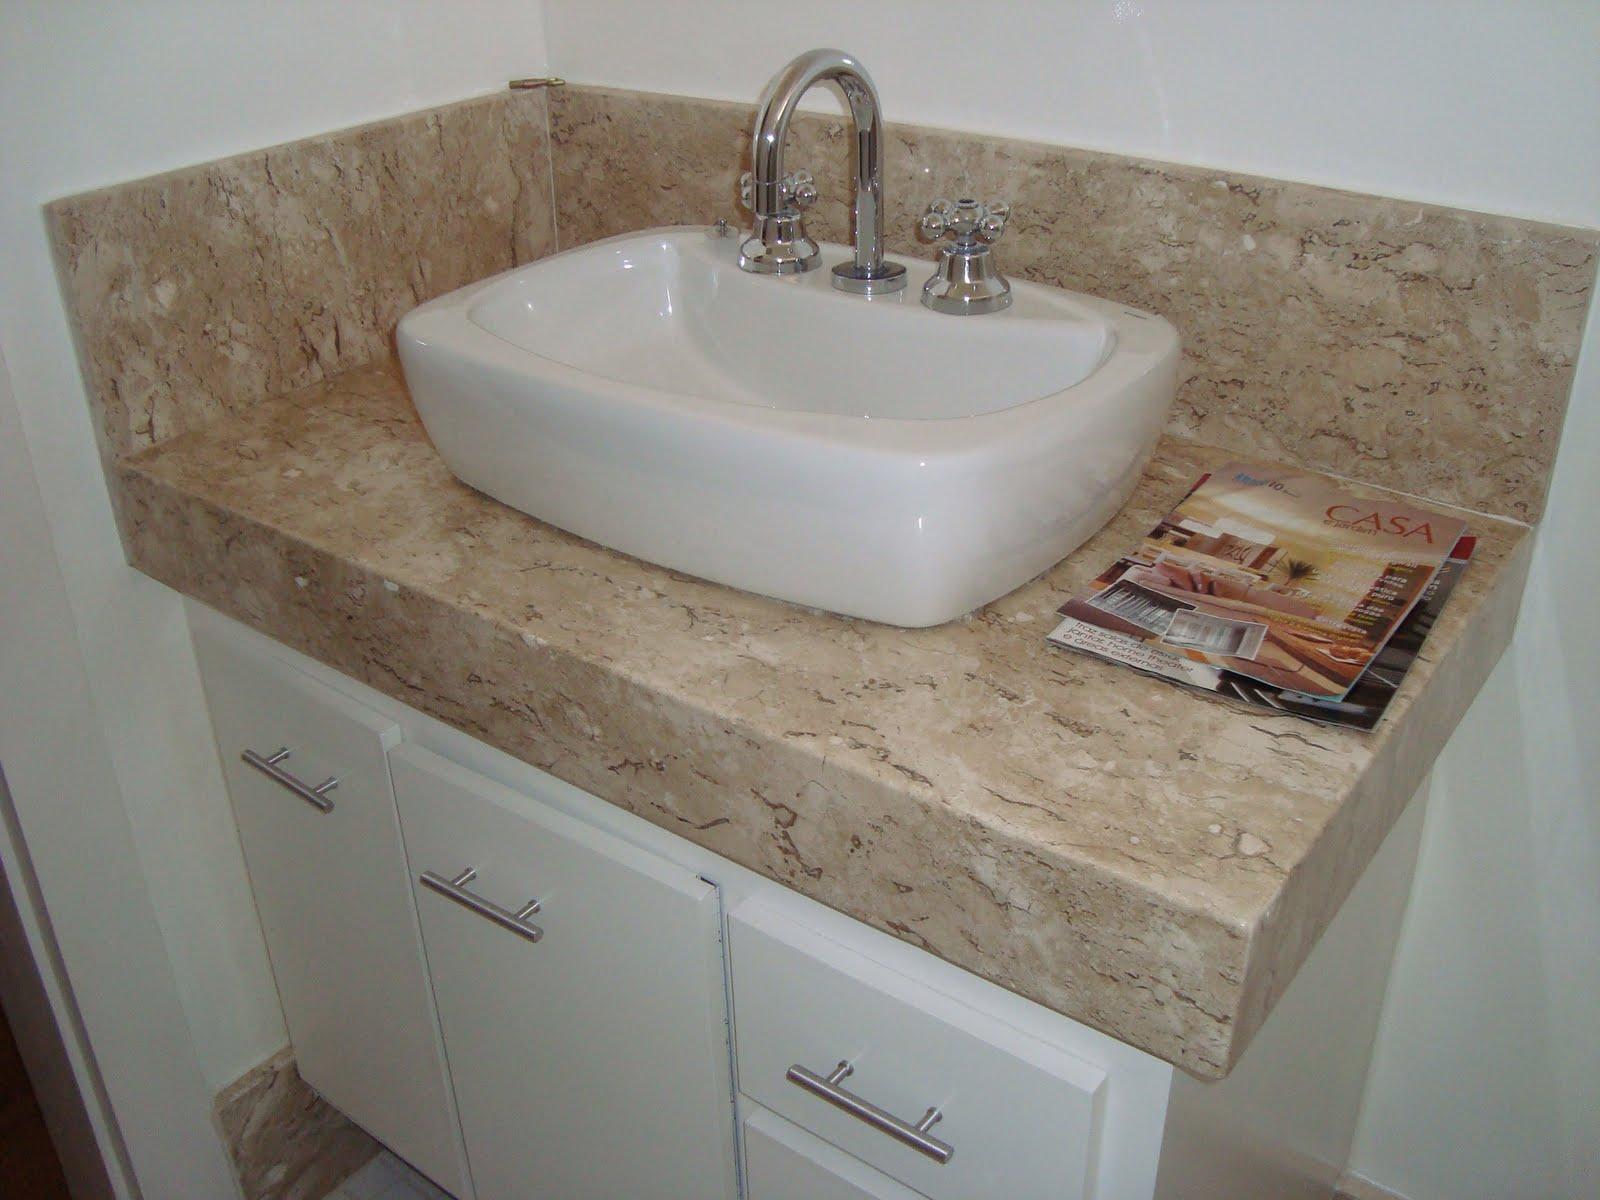 Construindo Minha Casa Clean Banheiros e Lavabos! Maravilhosos!!! -> Limpeza De Pia De Banheiro